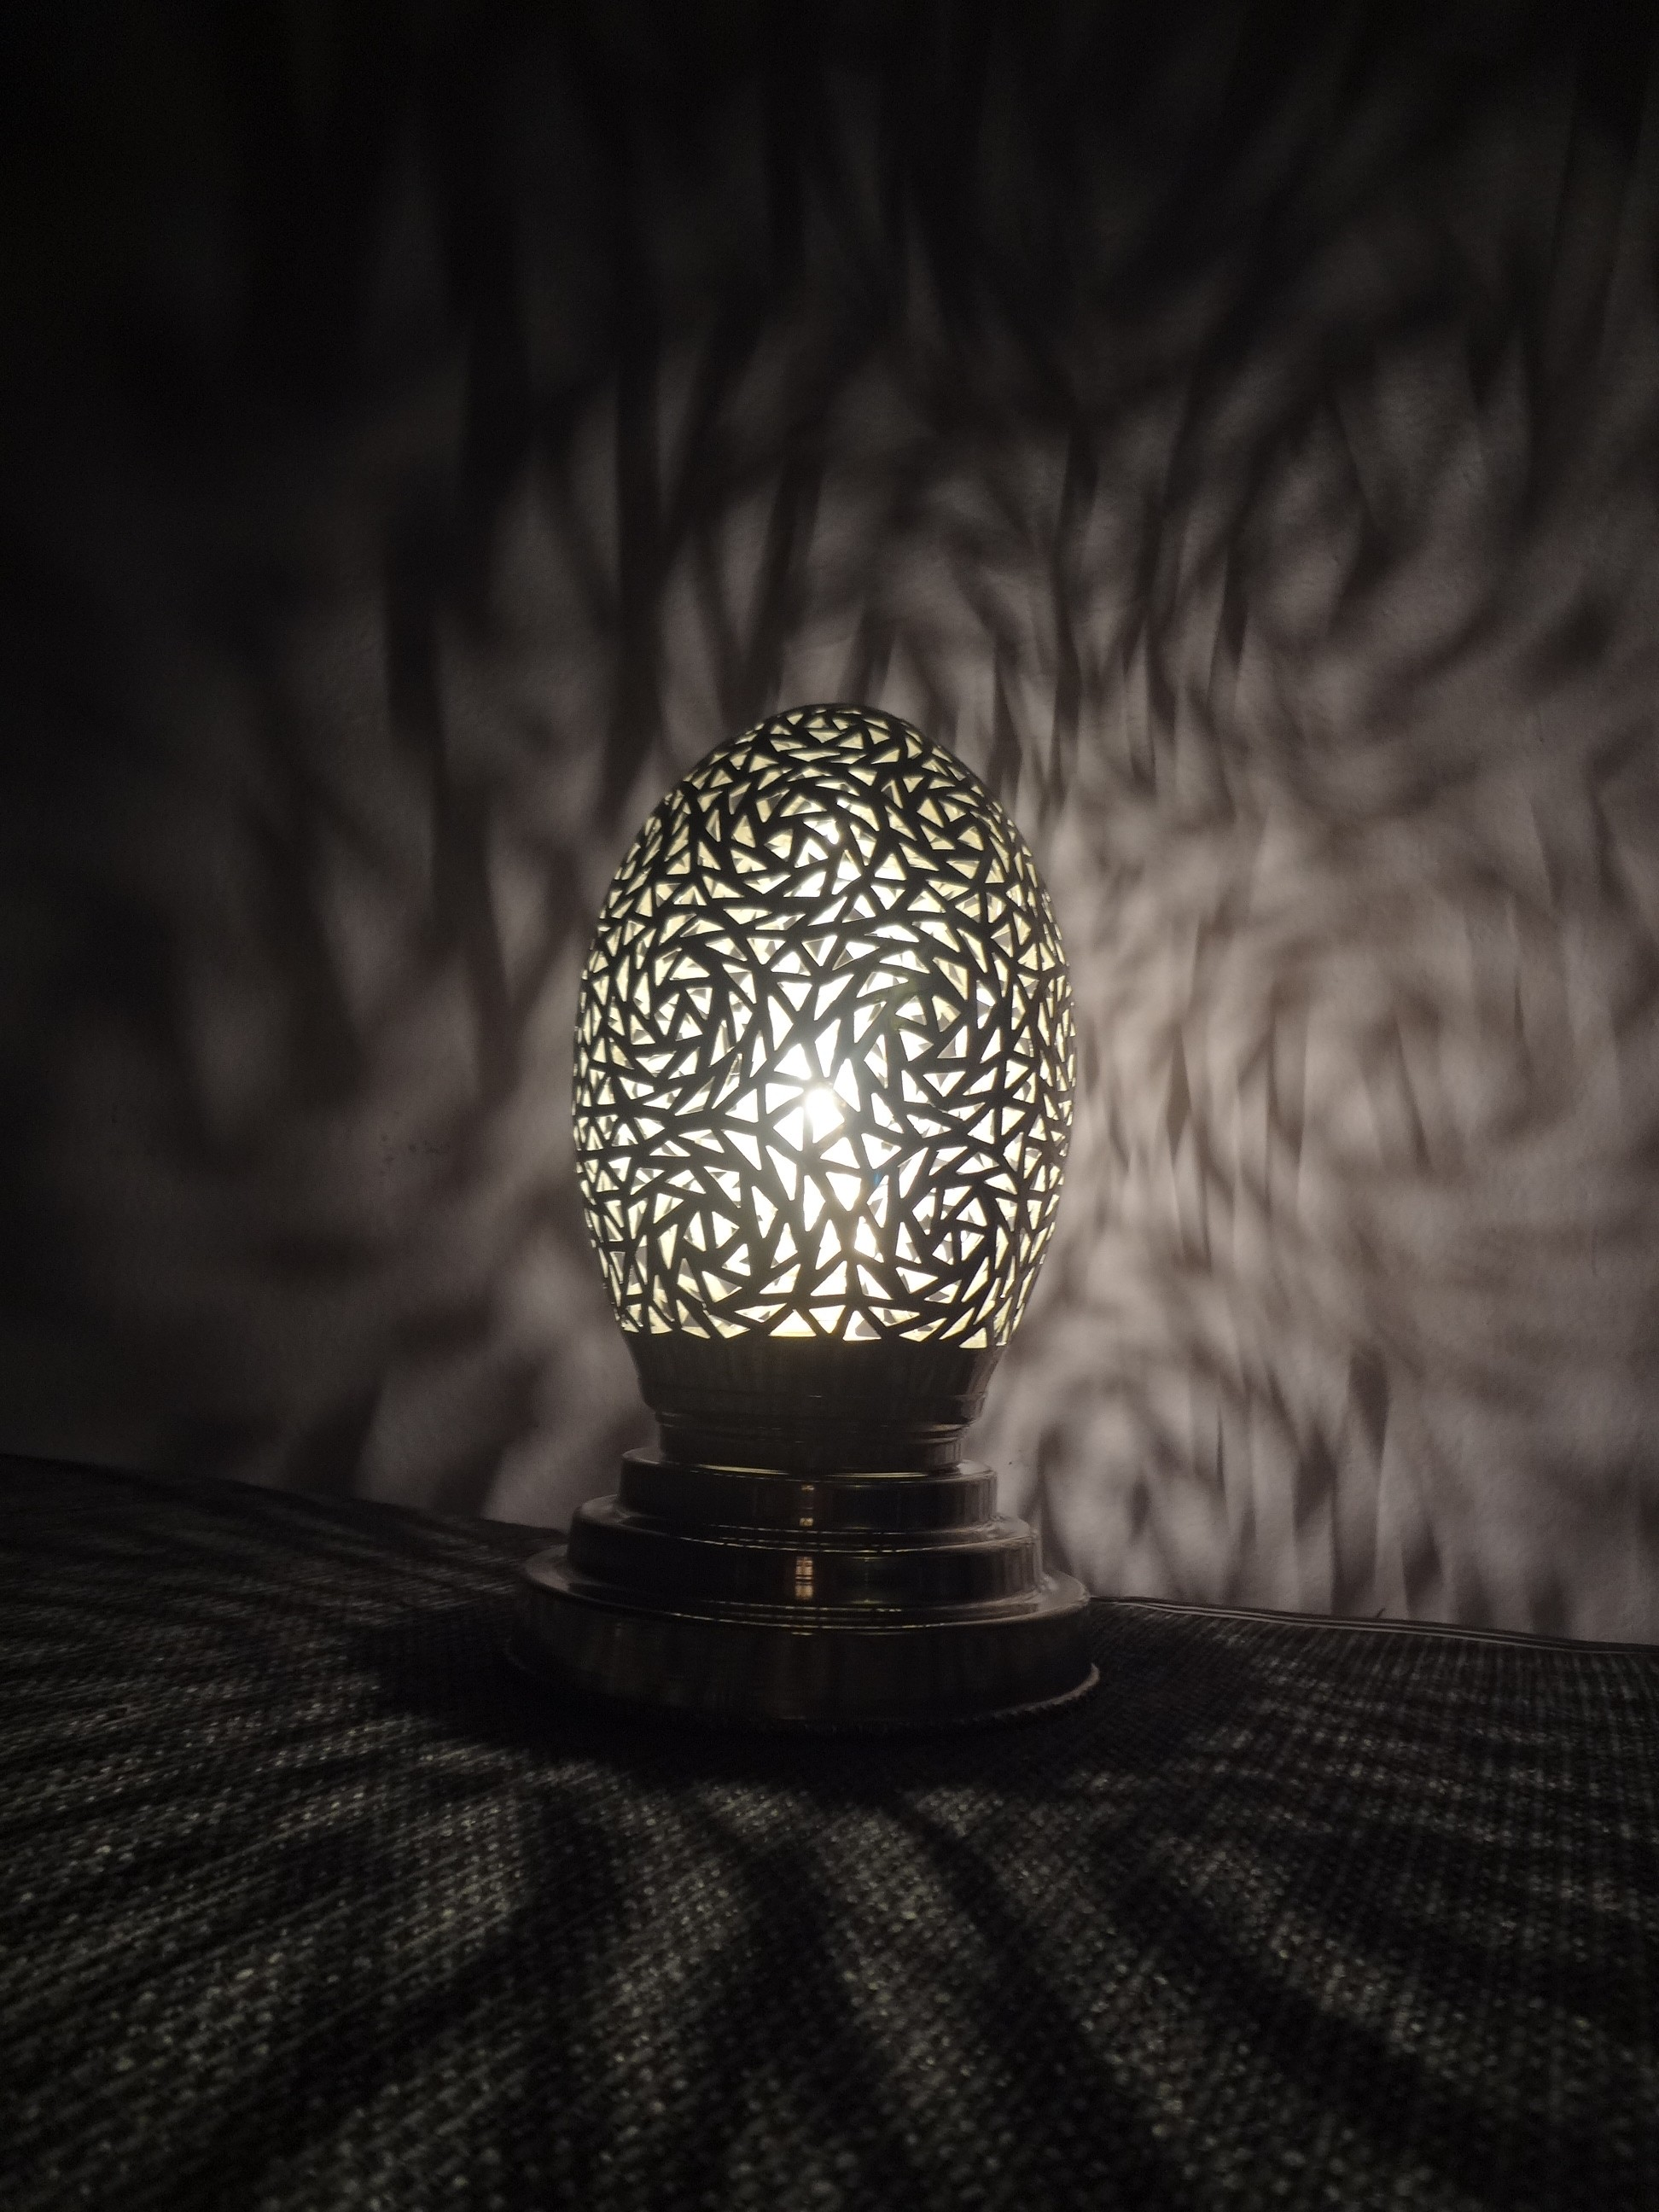 Stehlampe De Luxe, 27 cm